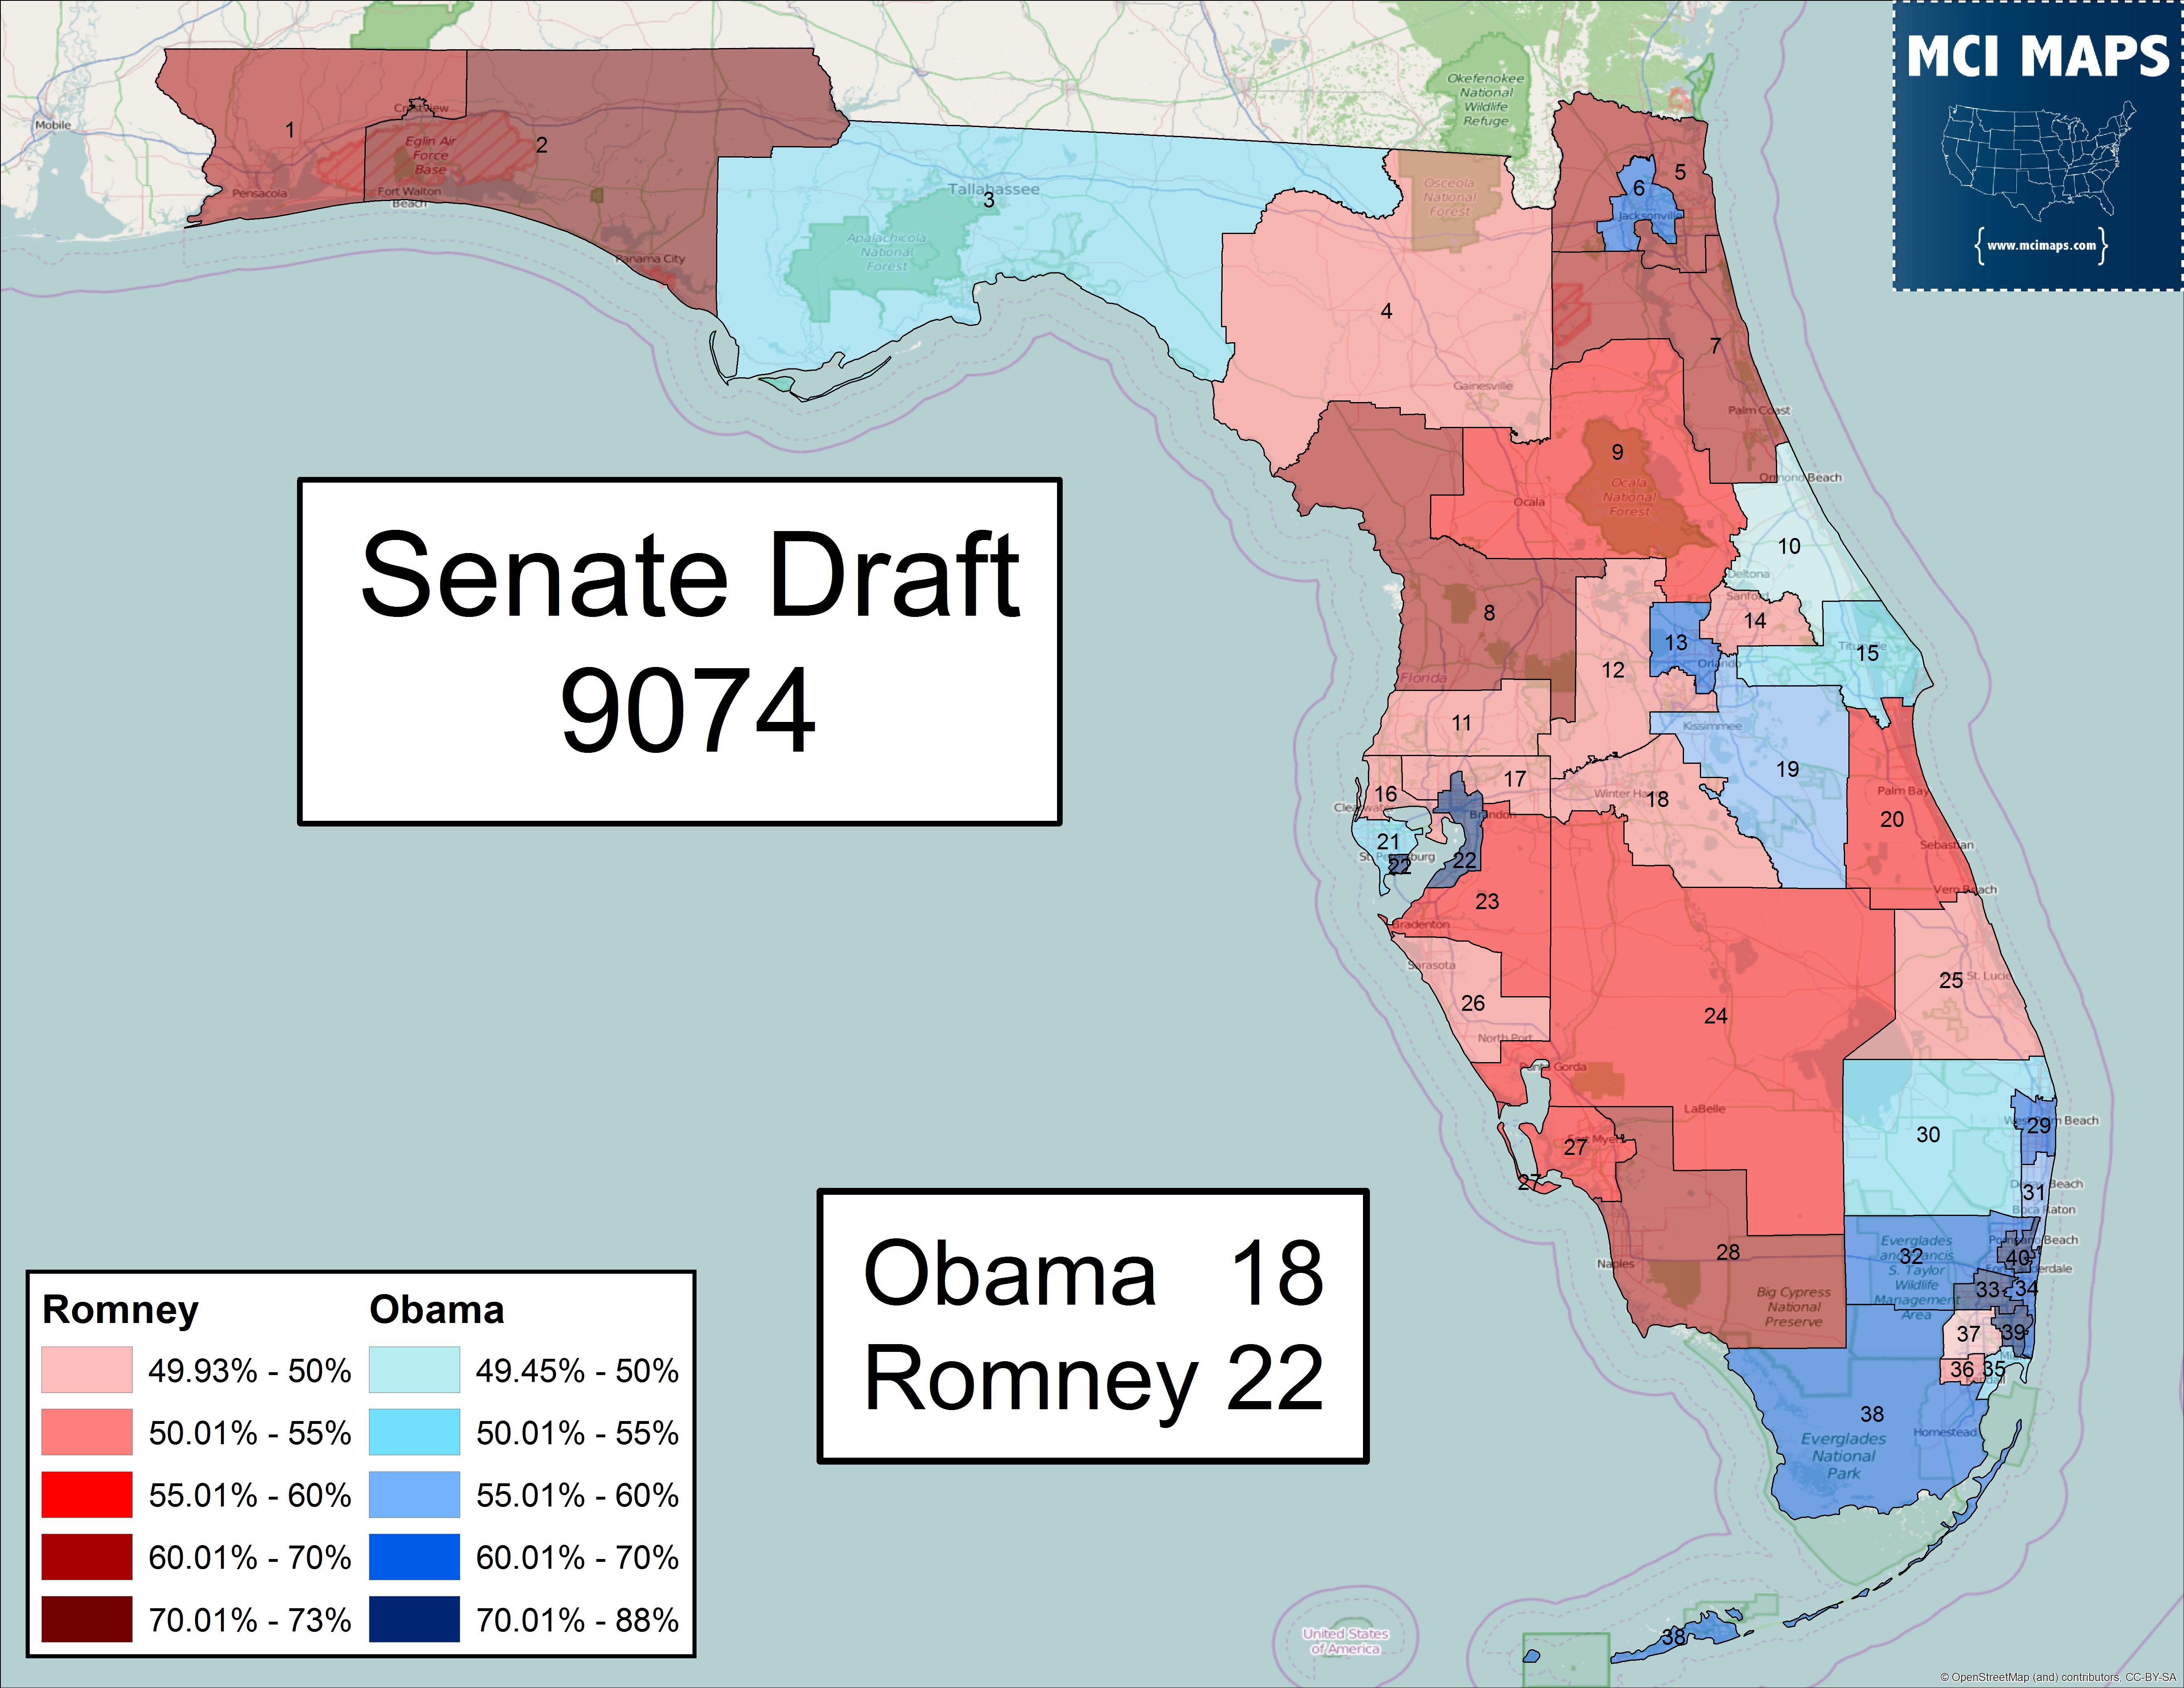 Senate 9074 President